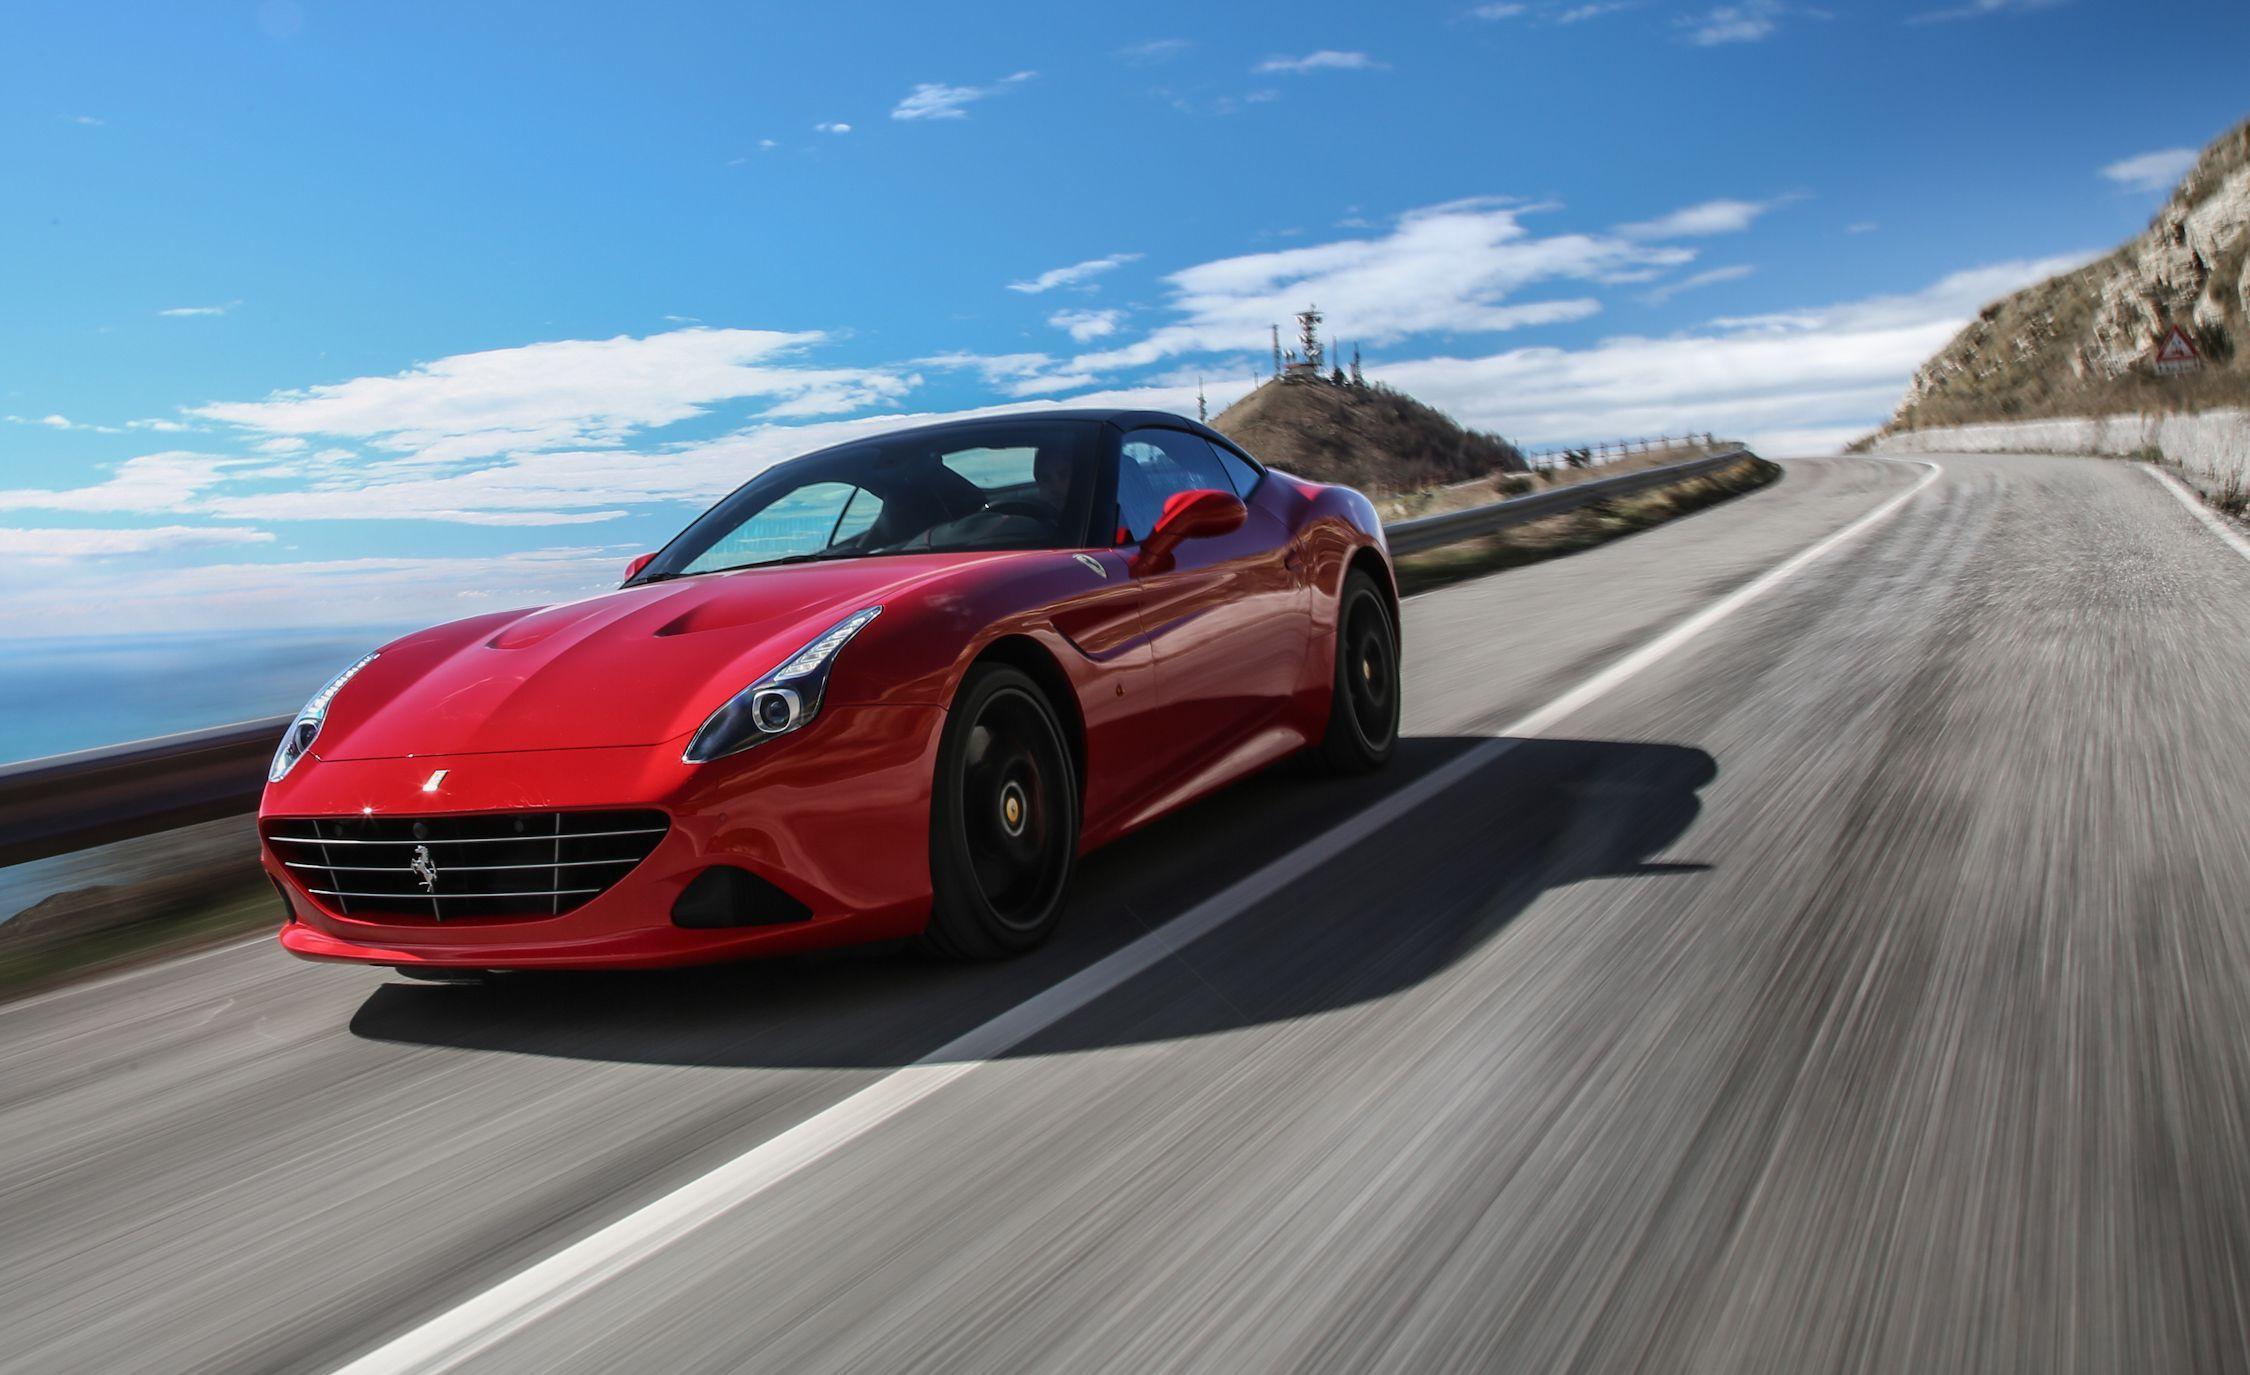 Ferrari California T Review Pricing And Specs